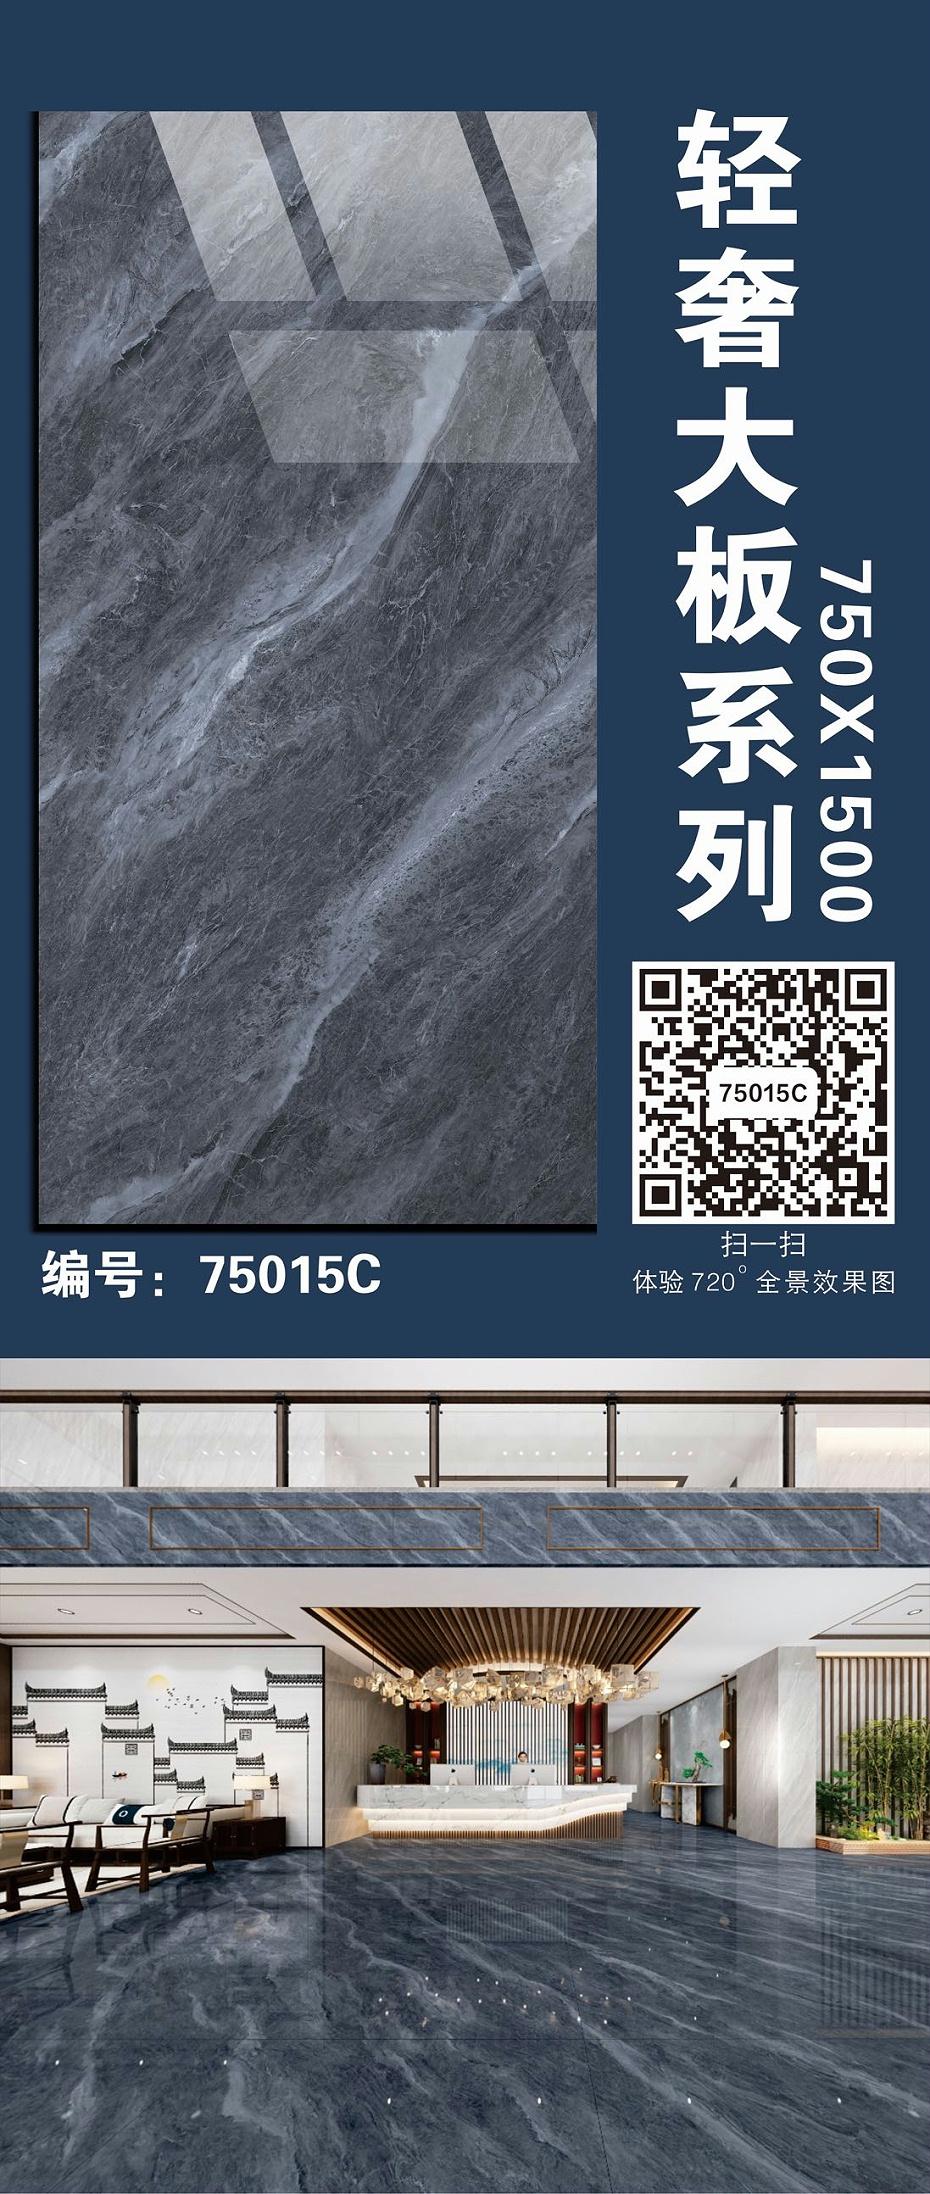 75015C